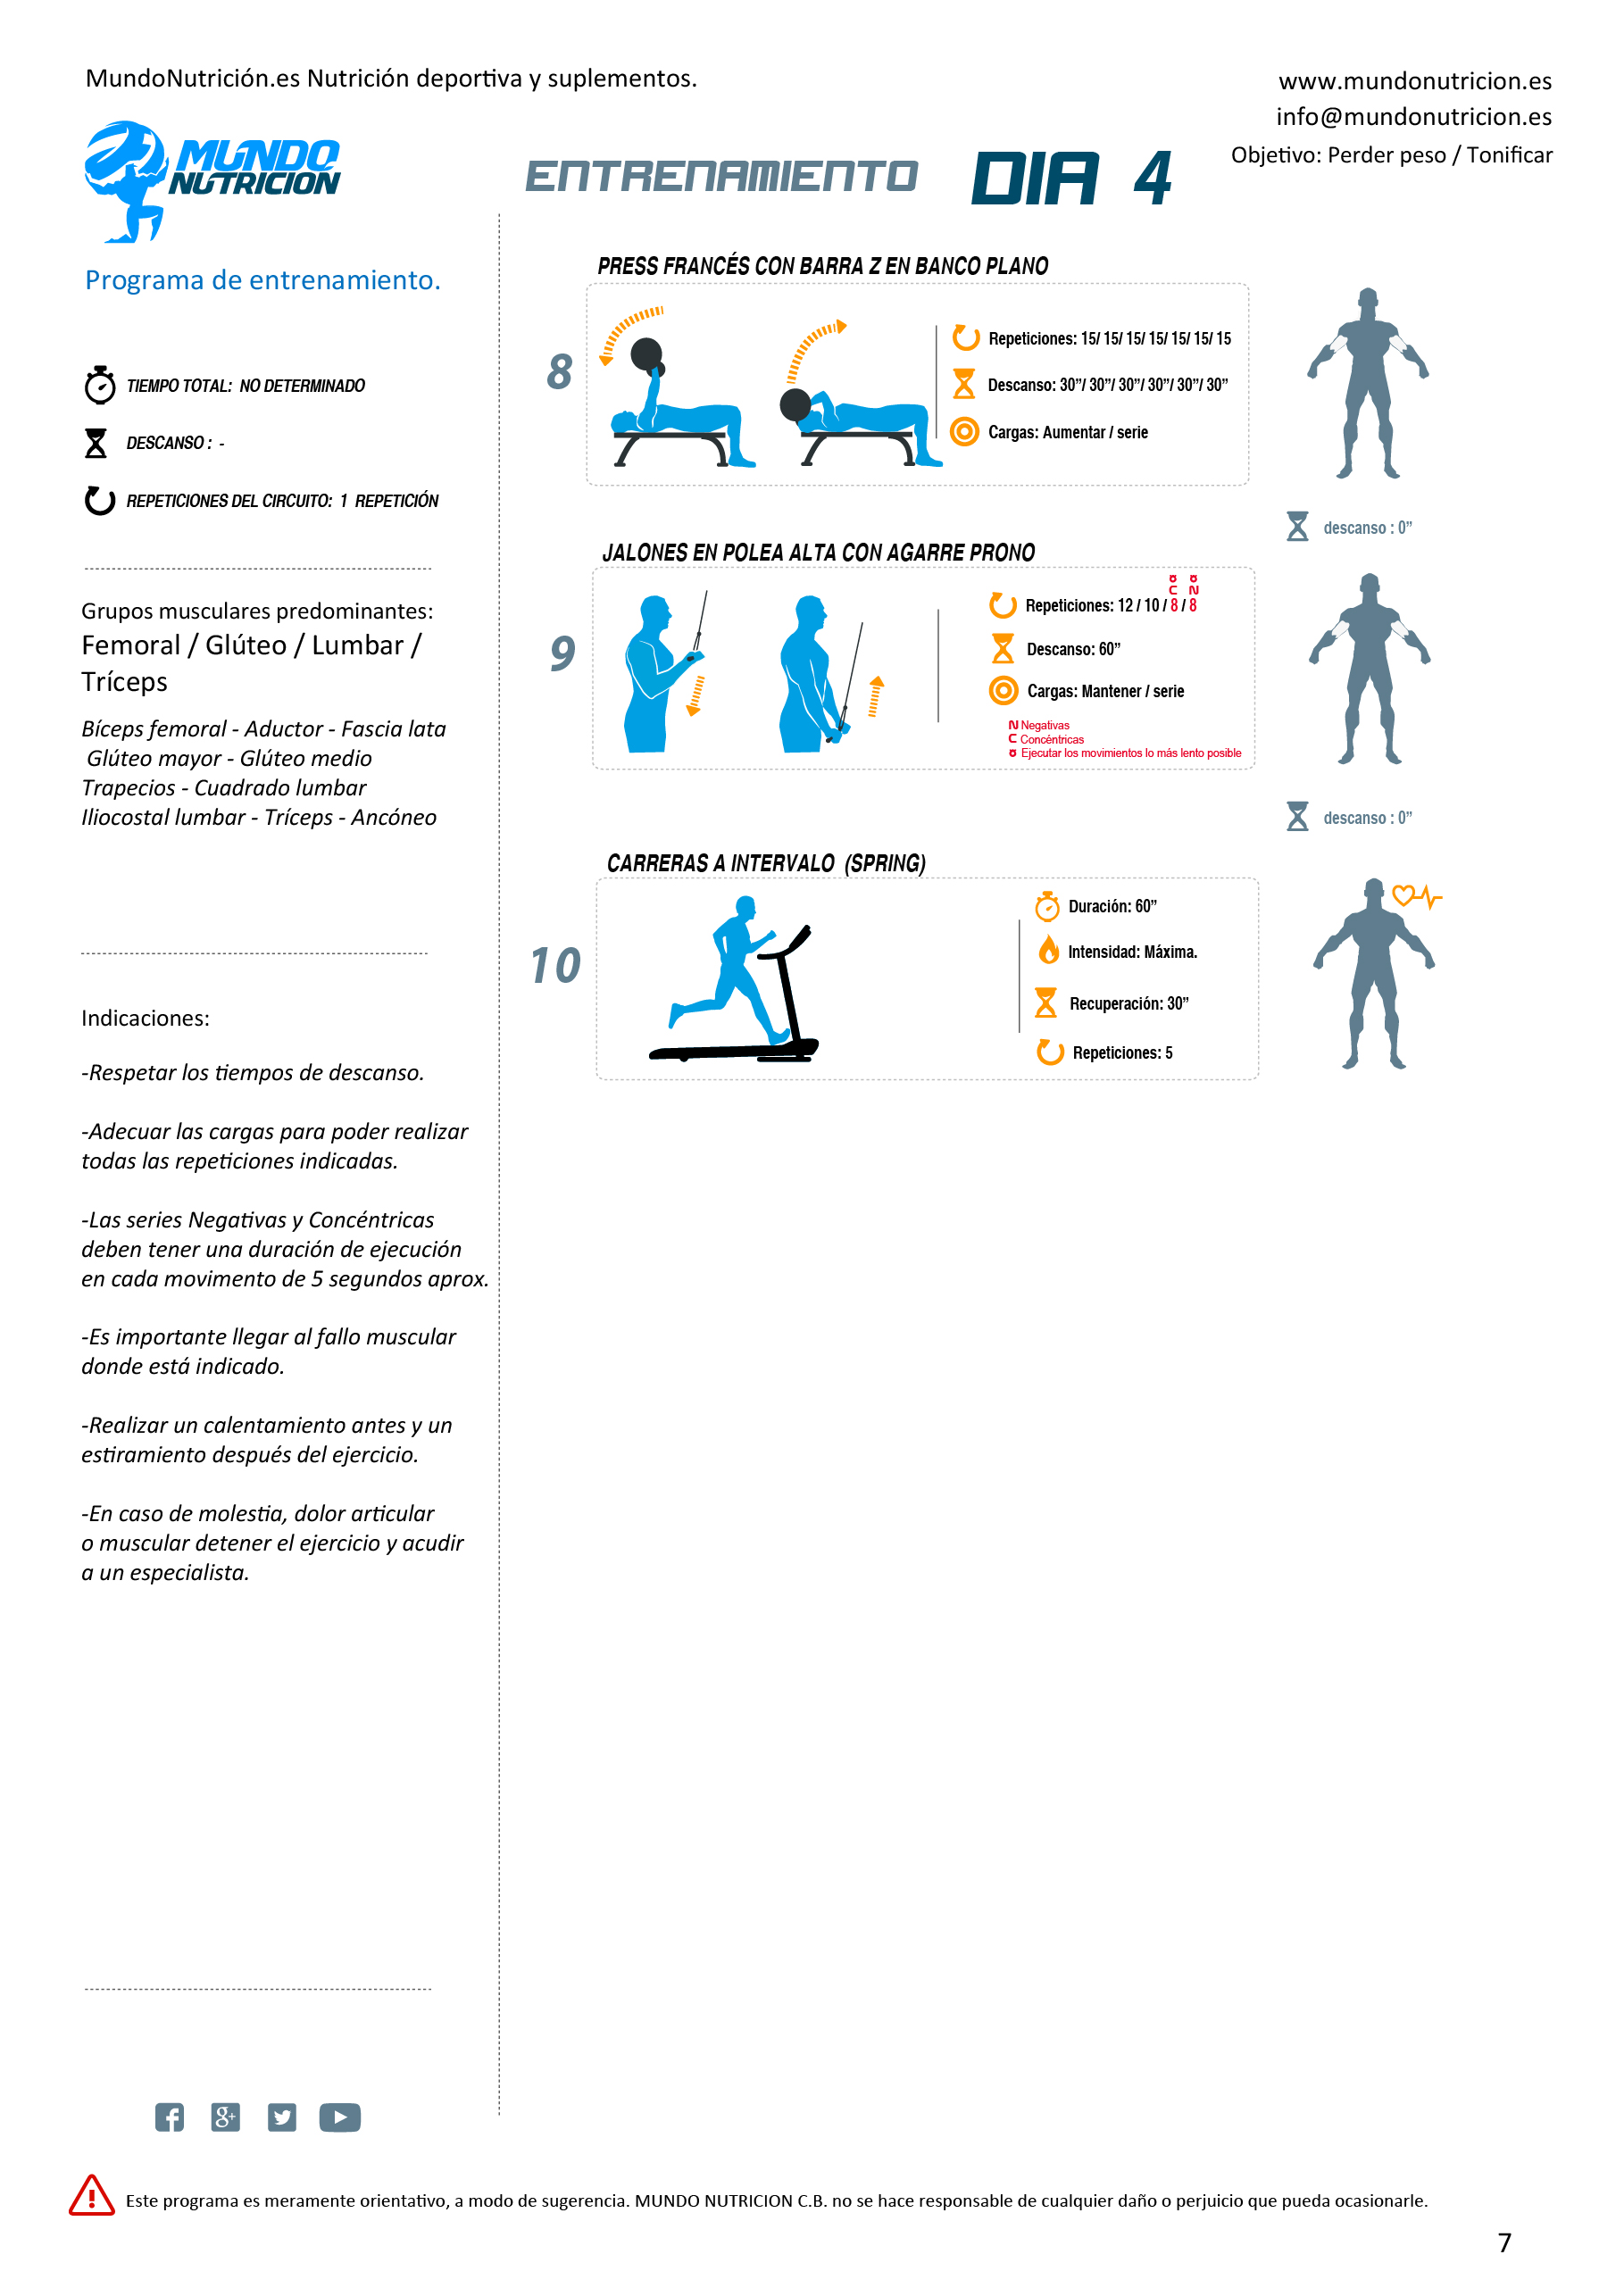 Día 4 femoral gluteo lumbar triceps